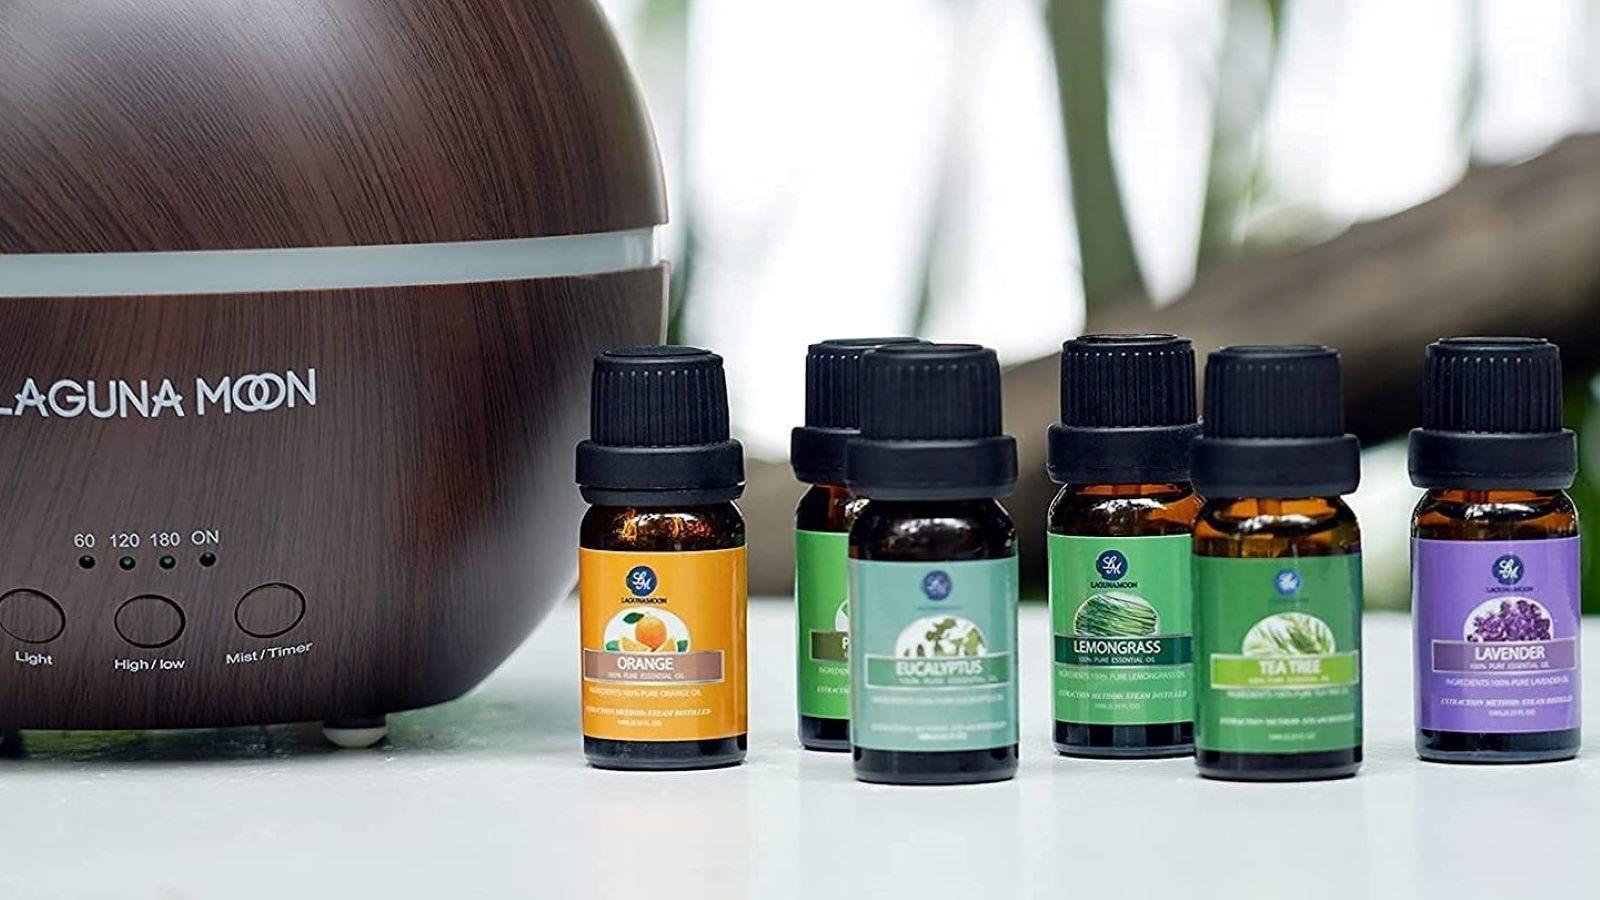 Six bottles of Laguna Moon Essential Oils next to the Laguna Moon diffuser.